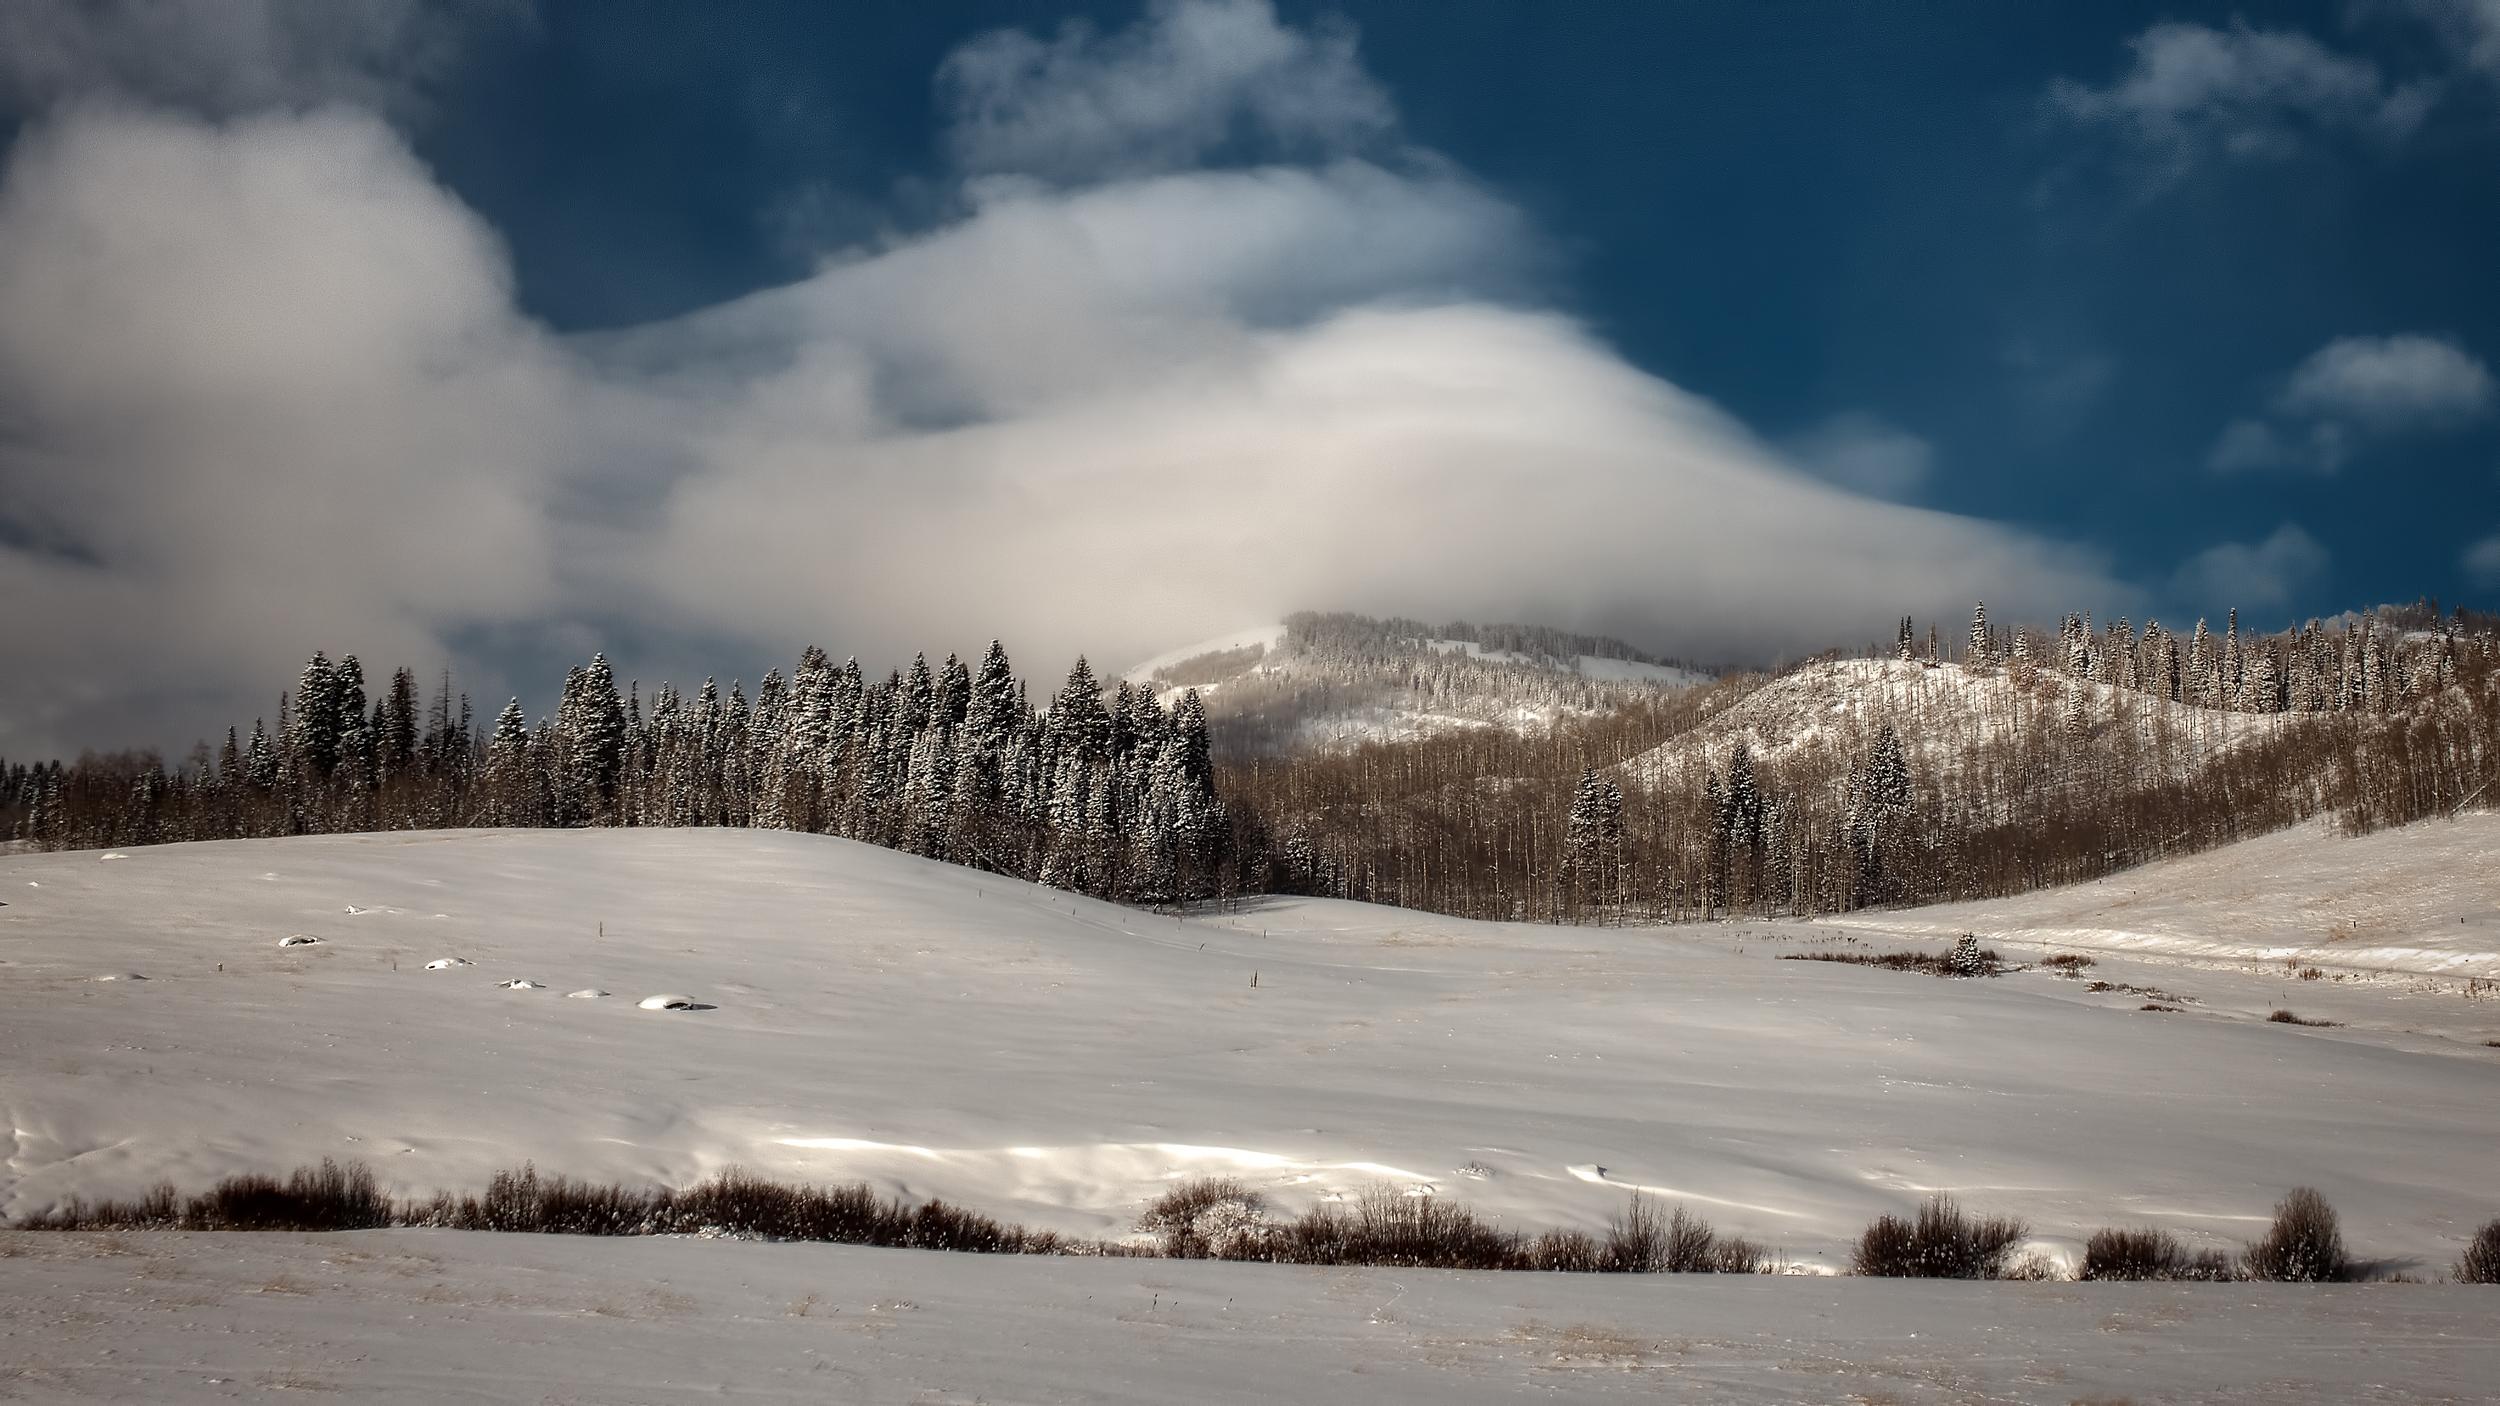 Sunlight Mountain, Glenwood Springs Colorado